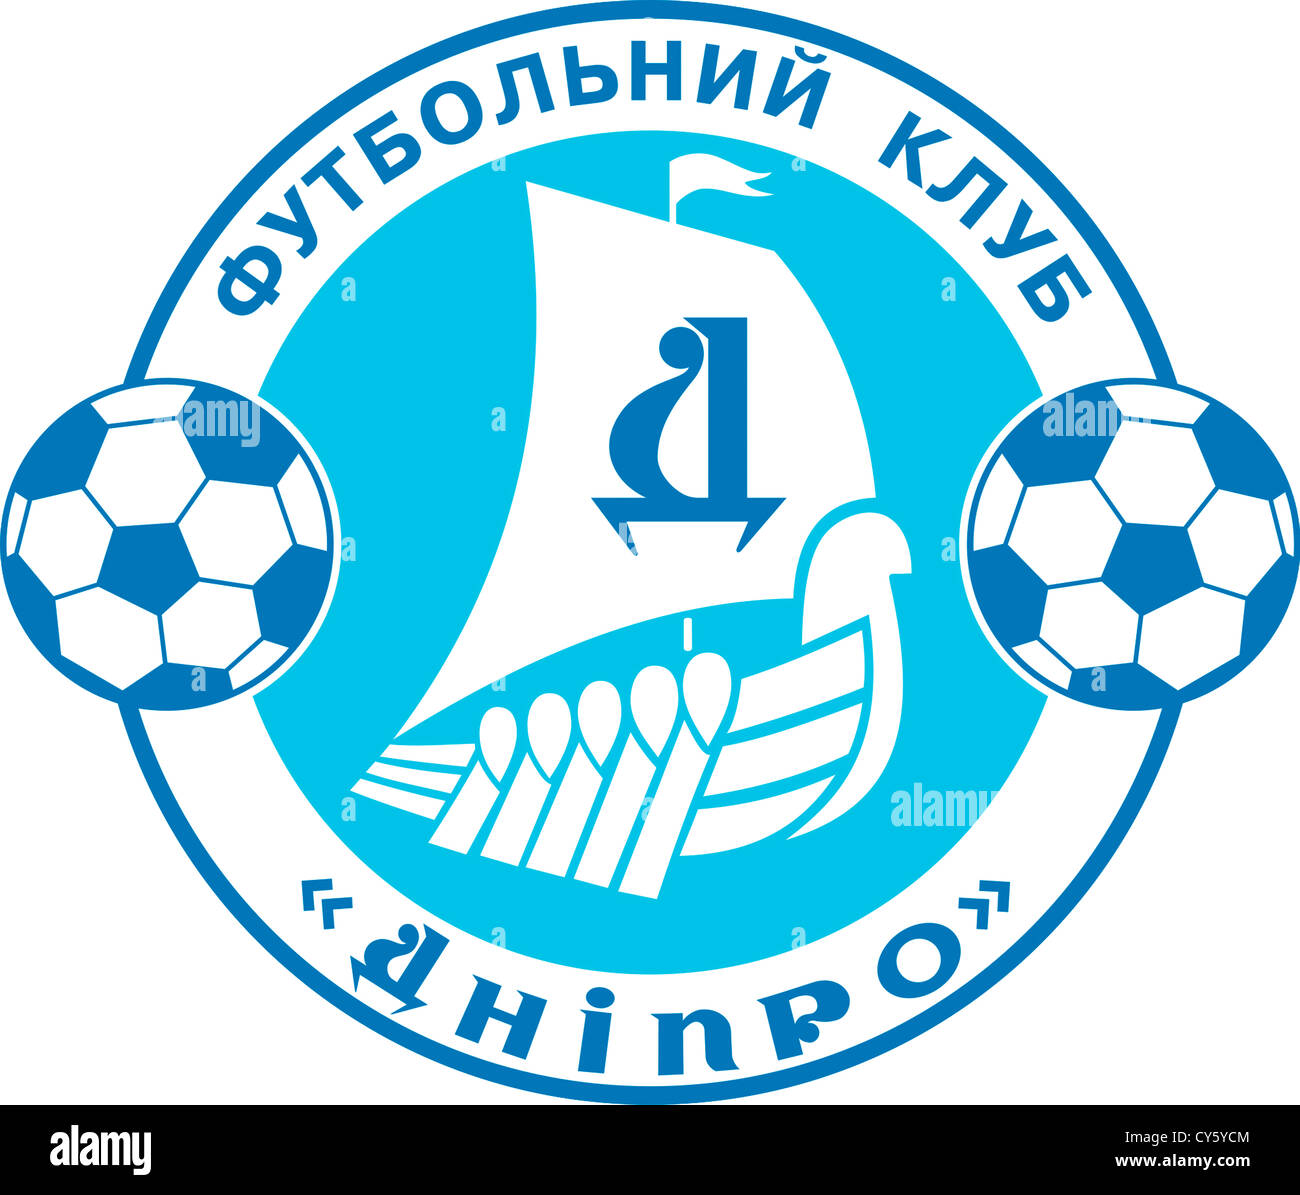 Logo of Ukrainian football team FC Dnipro Dnipropetrovsk. - Stock Image